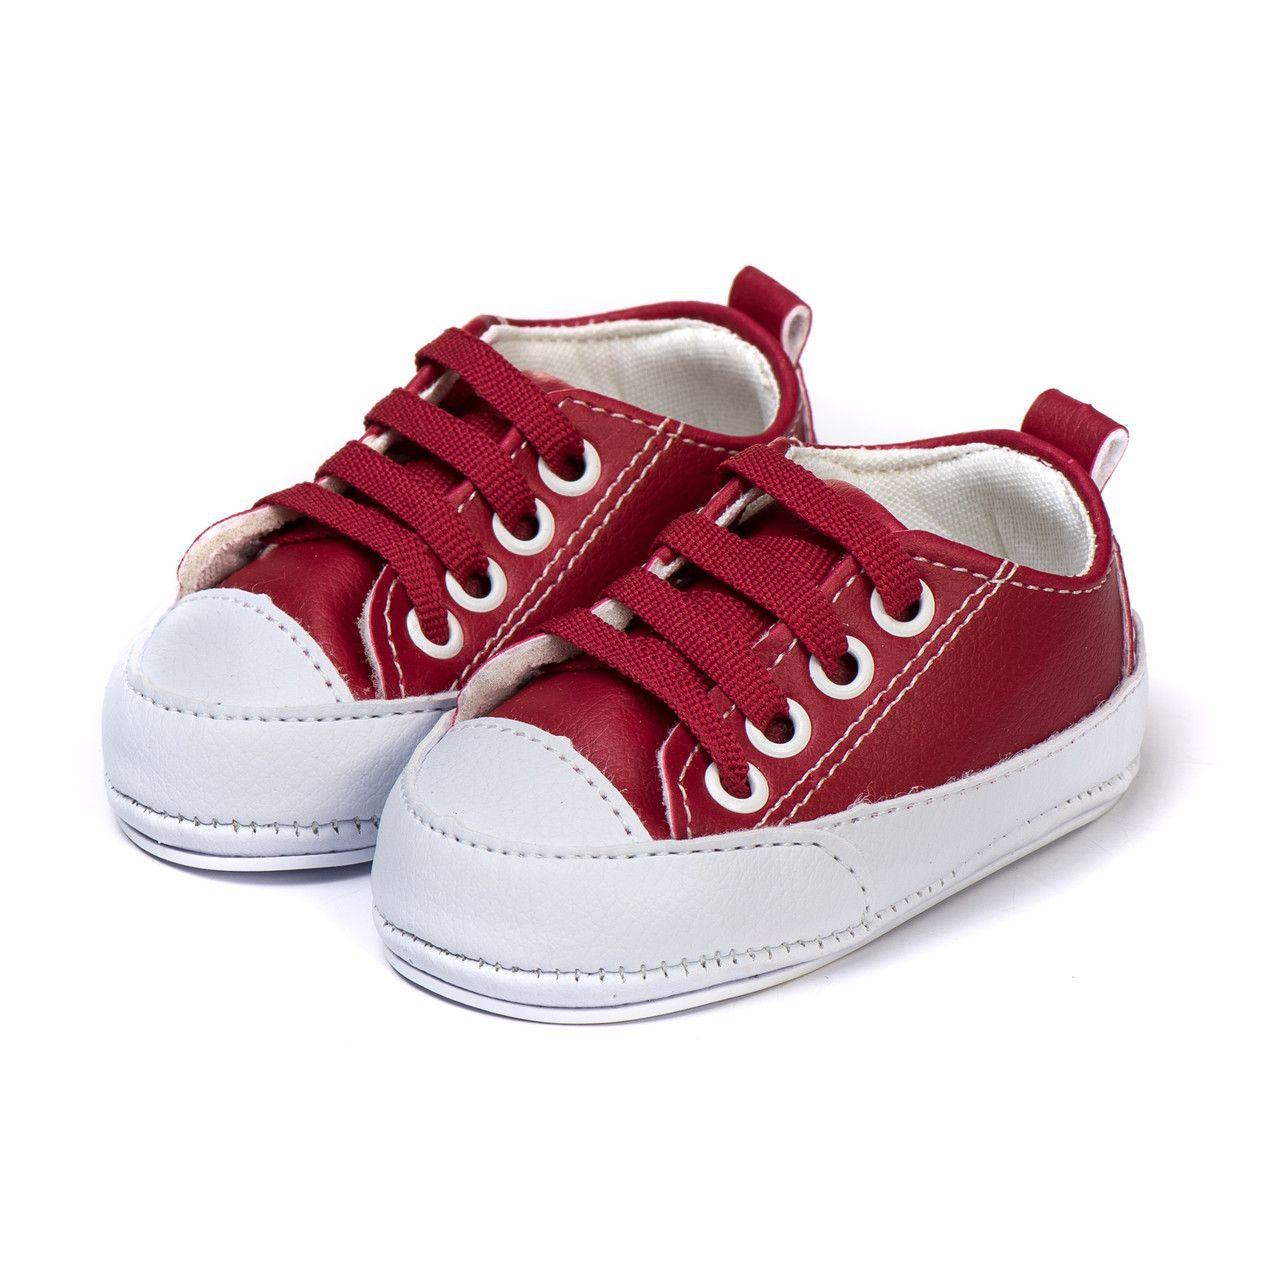 Tênis Bebe Kapell Infantil  Vermelho e Branco